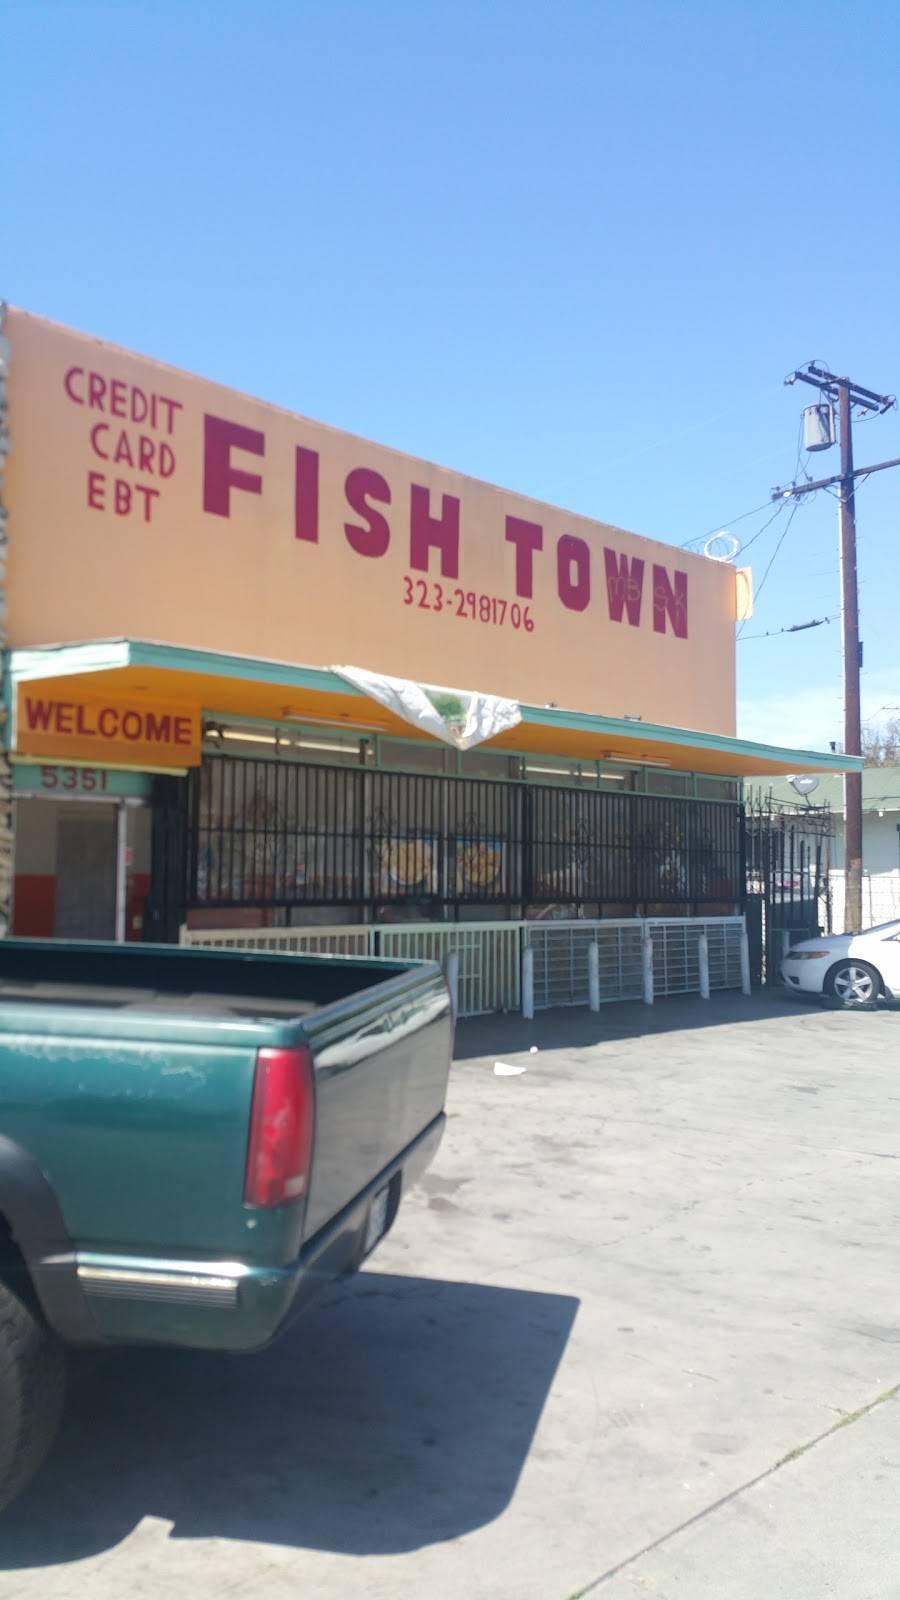 Fish Town   restaurant   5351 Arlington Ave, Los Angeles, CA 90043, USA   3232981706 OR +1 323-298-1706